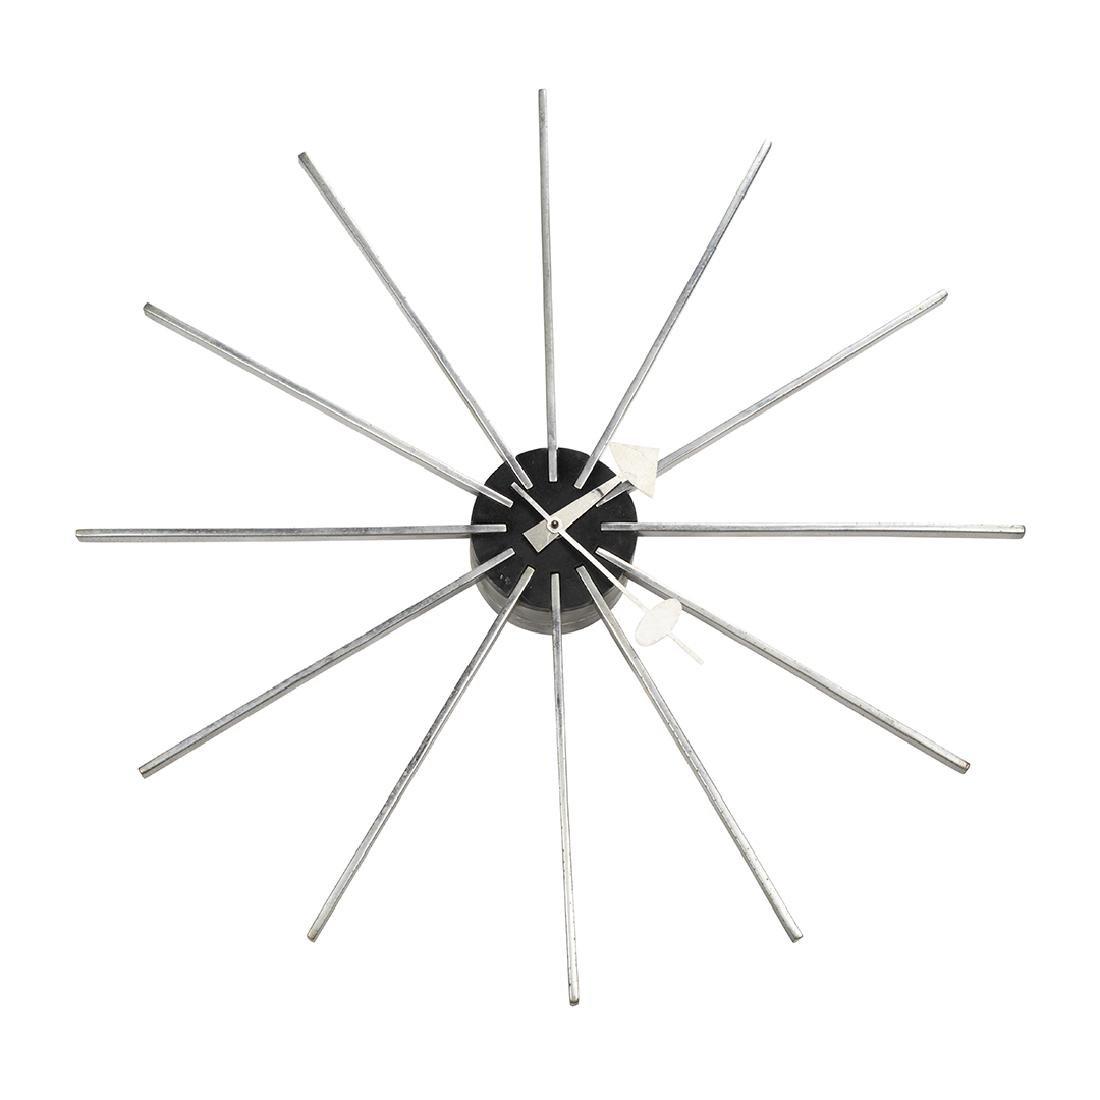 George Nelson Spike Clock Model 2227a